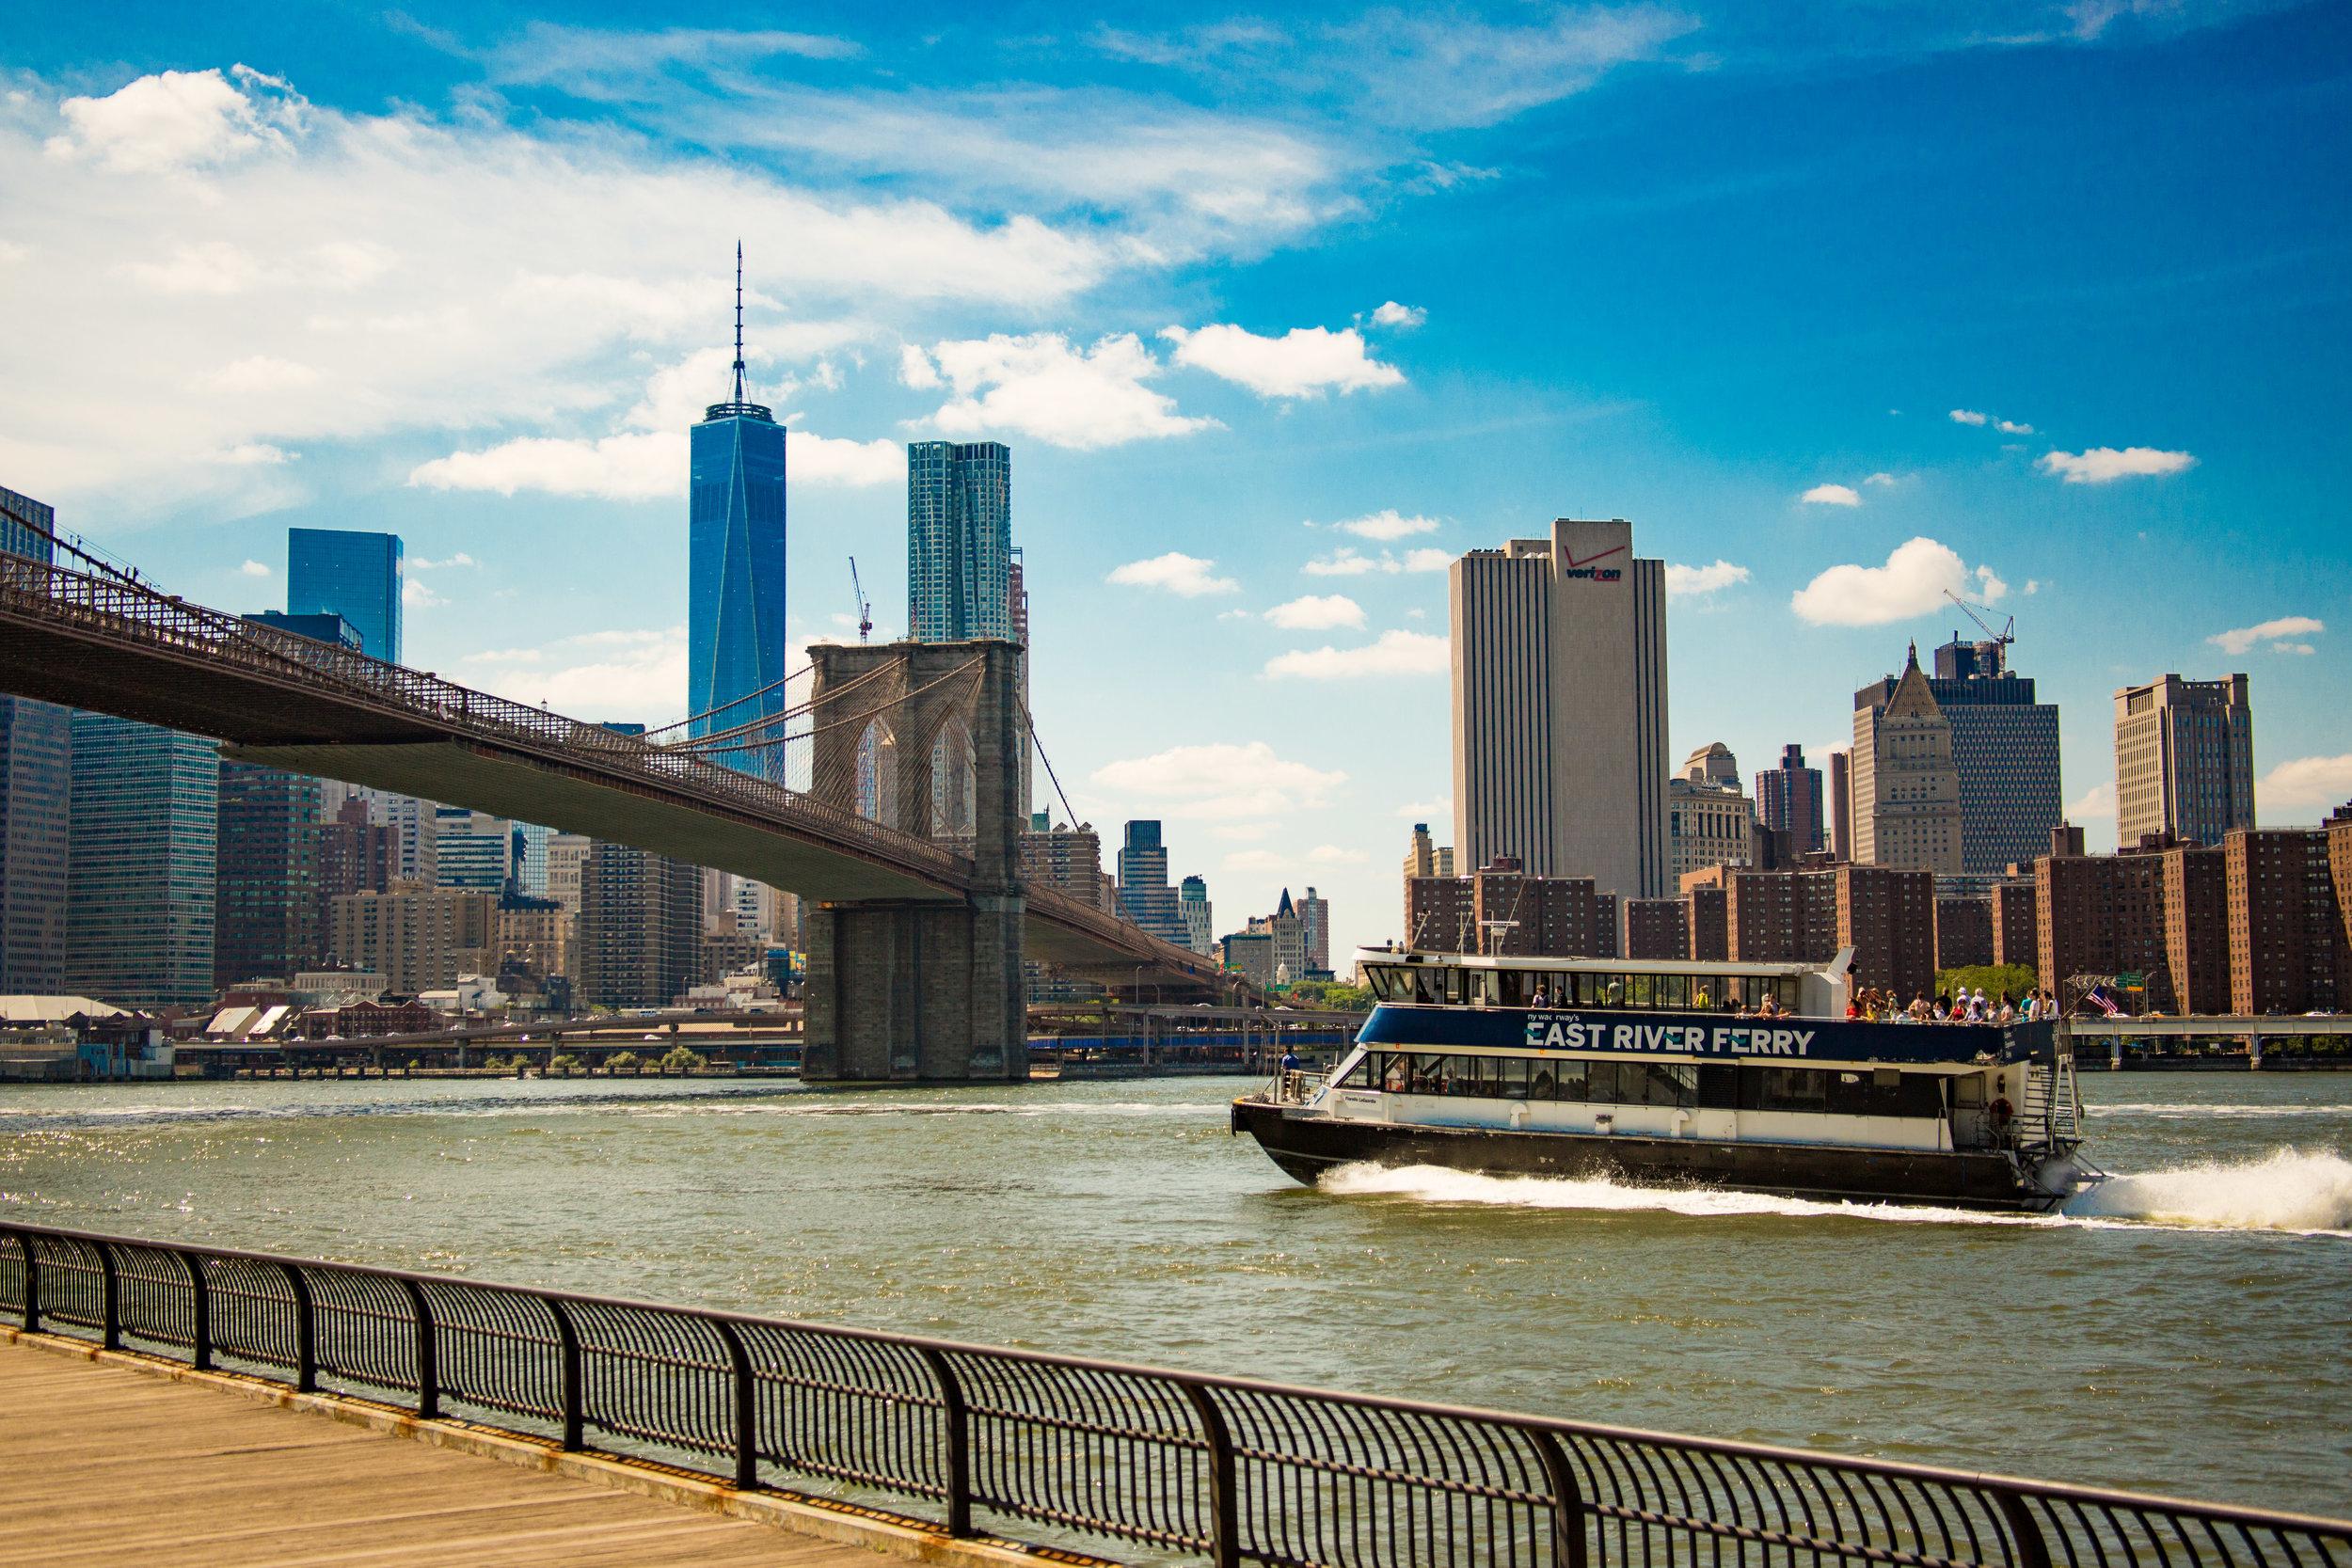 LSNY_Brooklyn_Bridge_Park-41.jpg